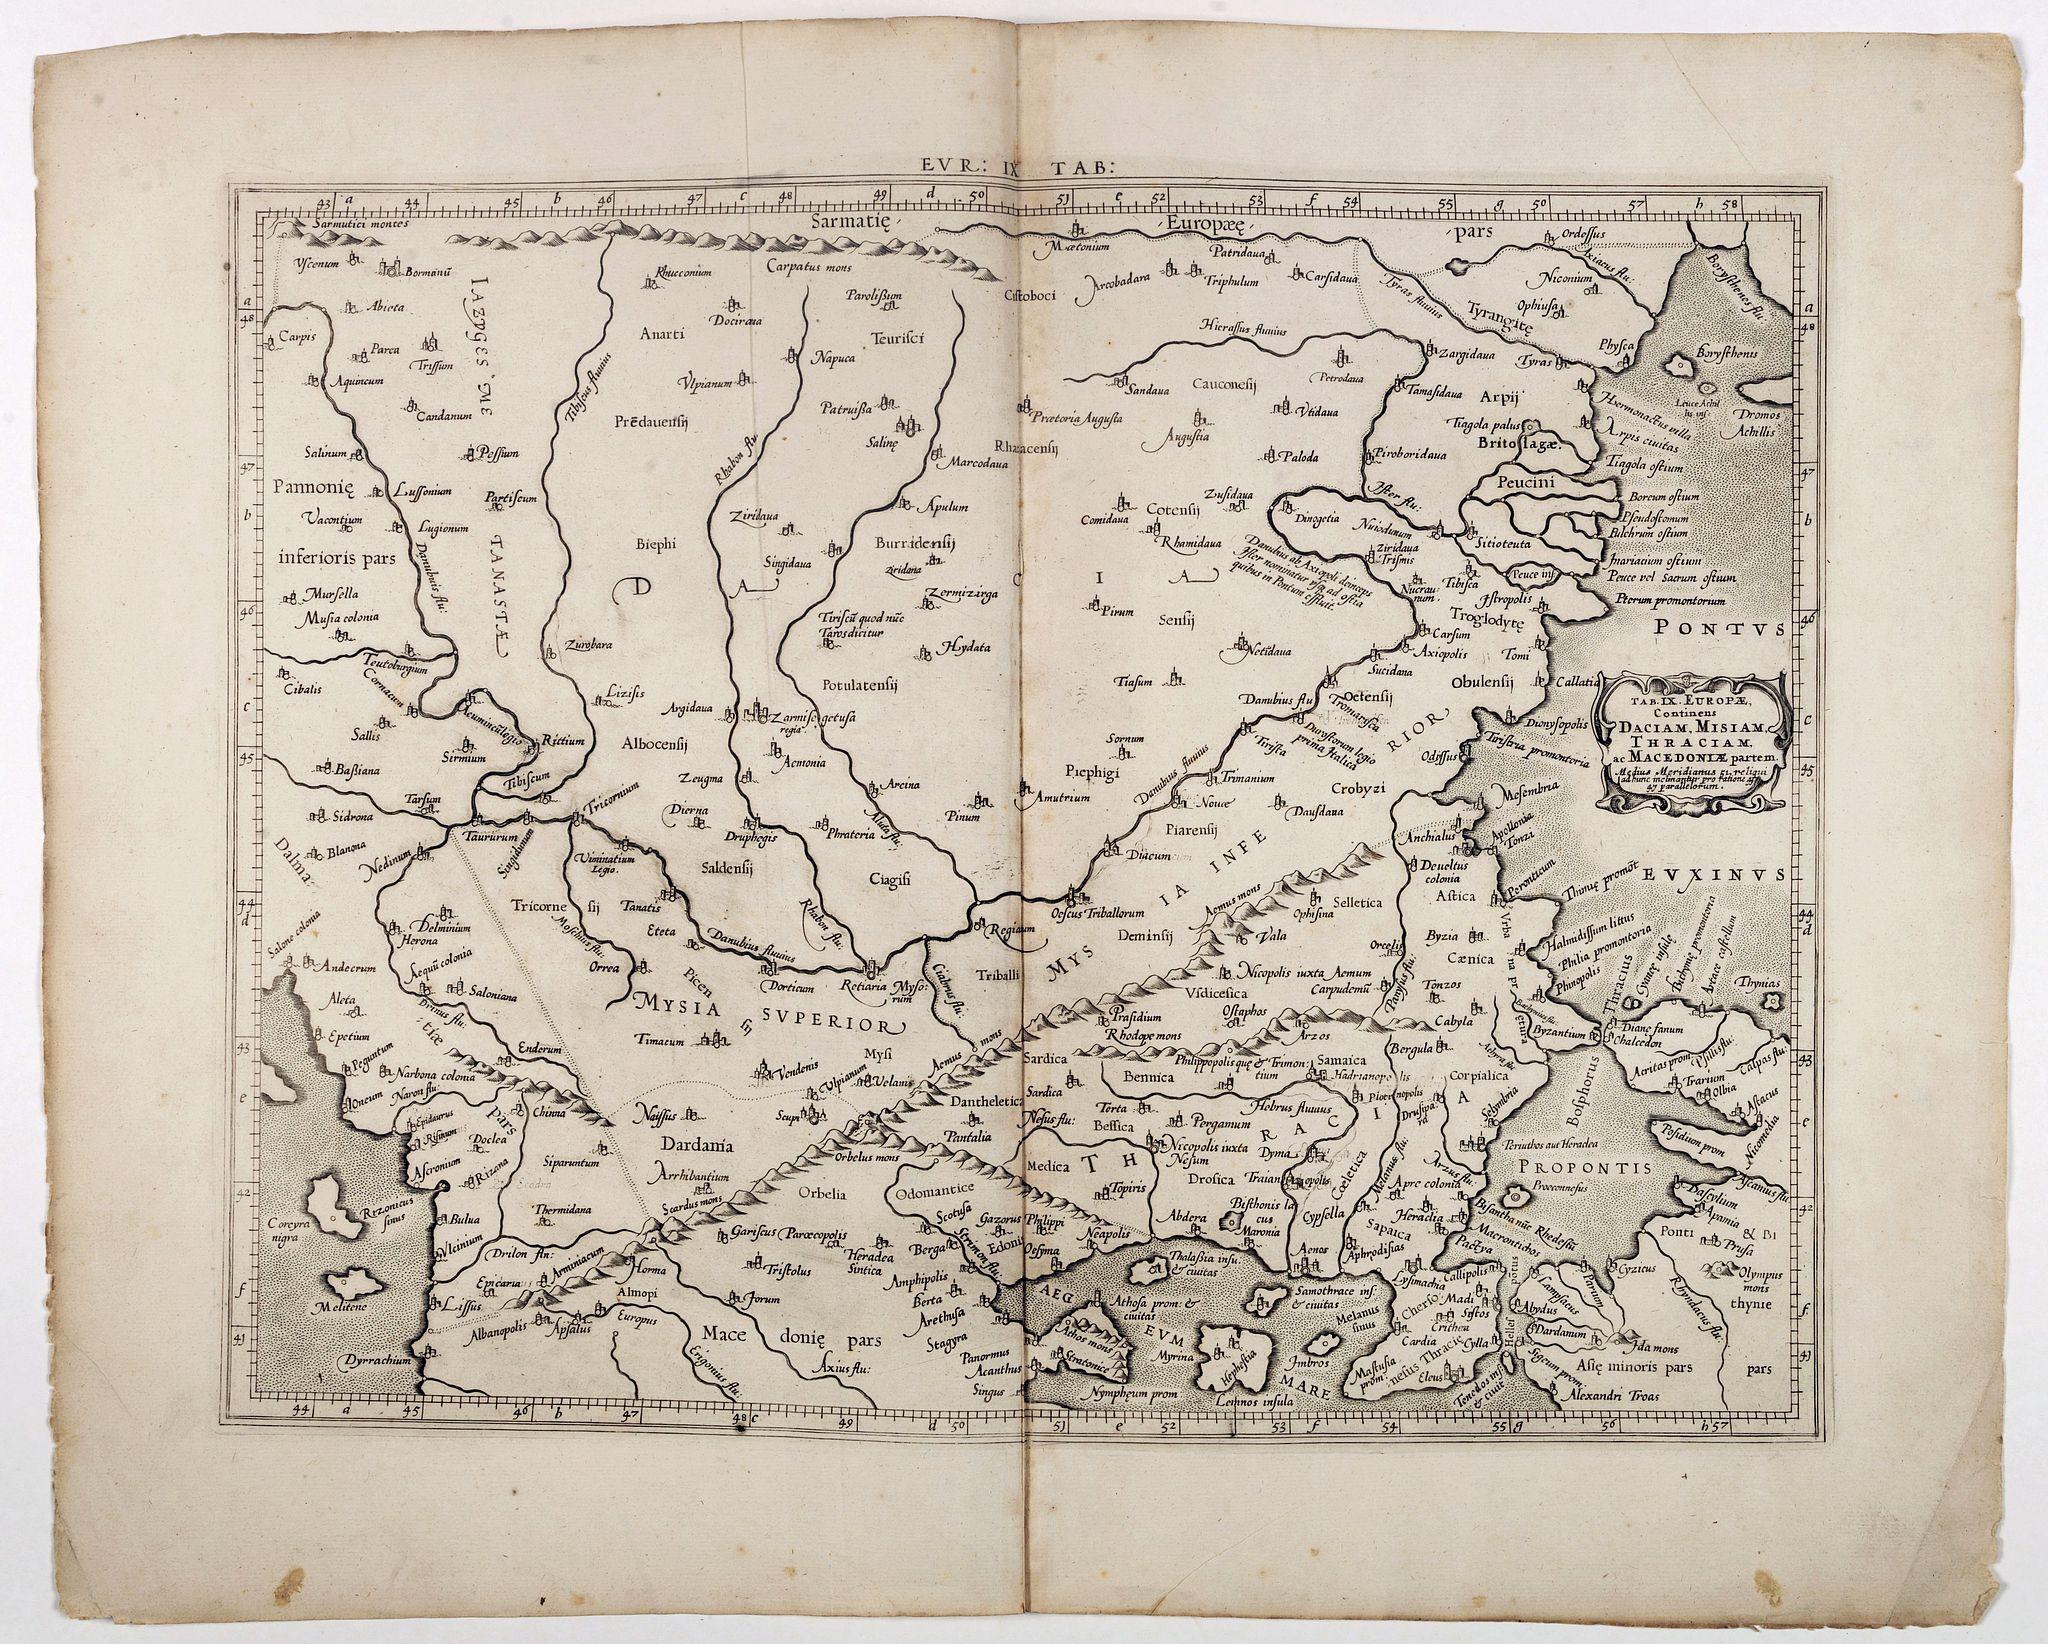 MERCATOR, G. / HONDIUS, J. -  Tab. IX Europae, Continens Daciam, Misiam, Thraciam, ac Macedoniae partem.